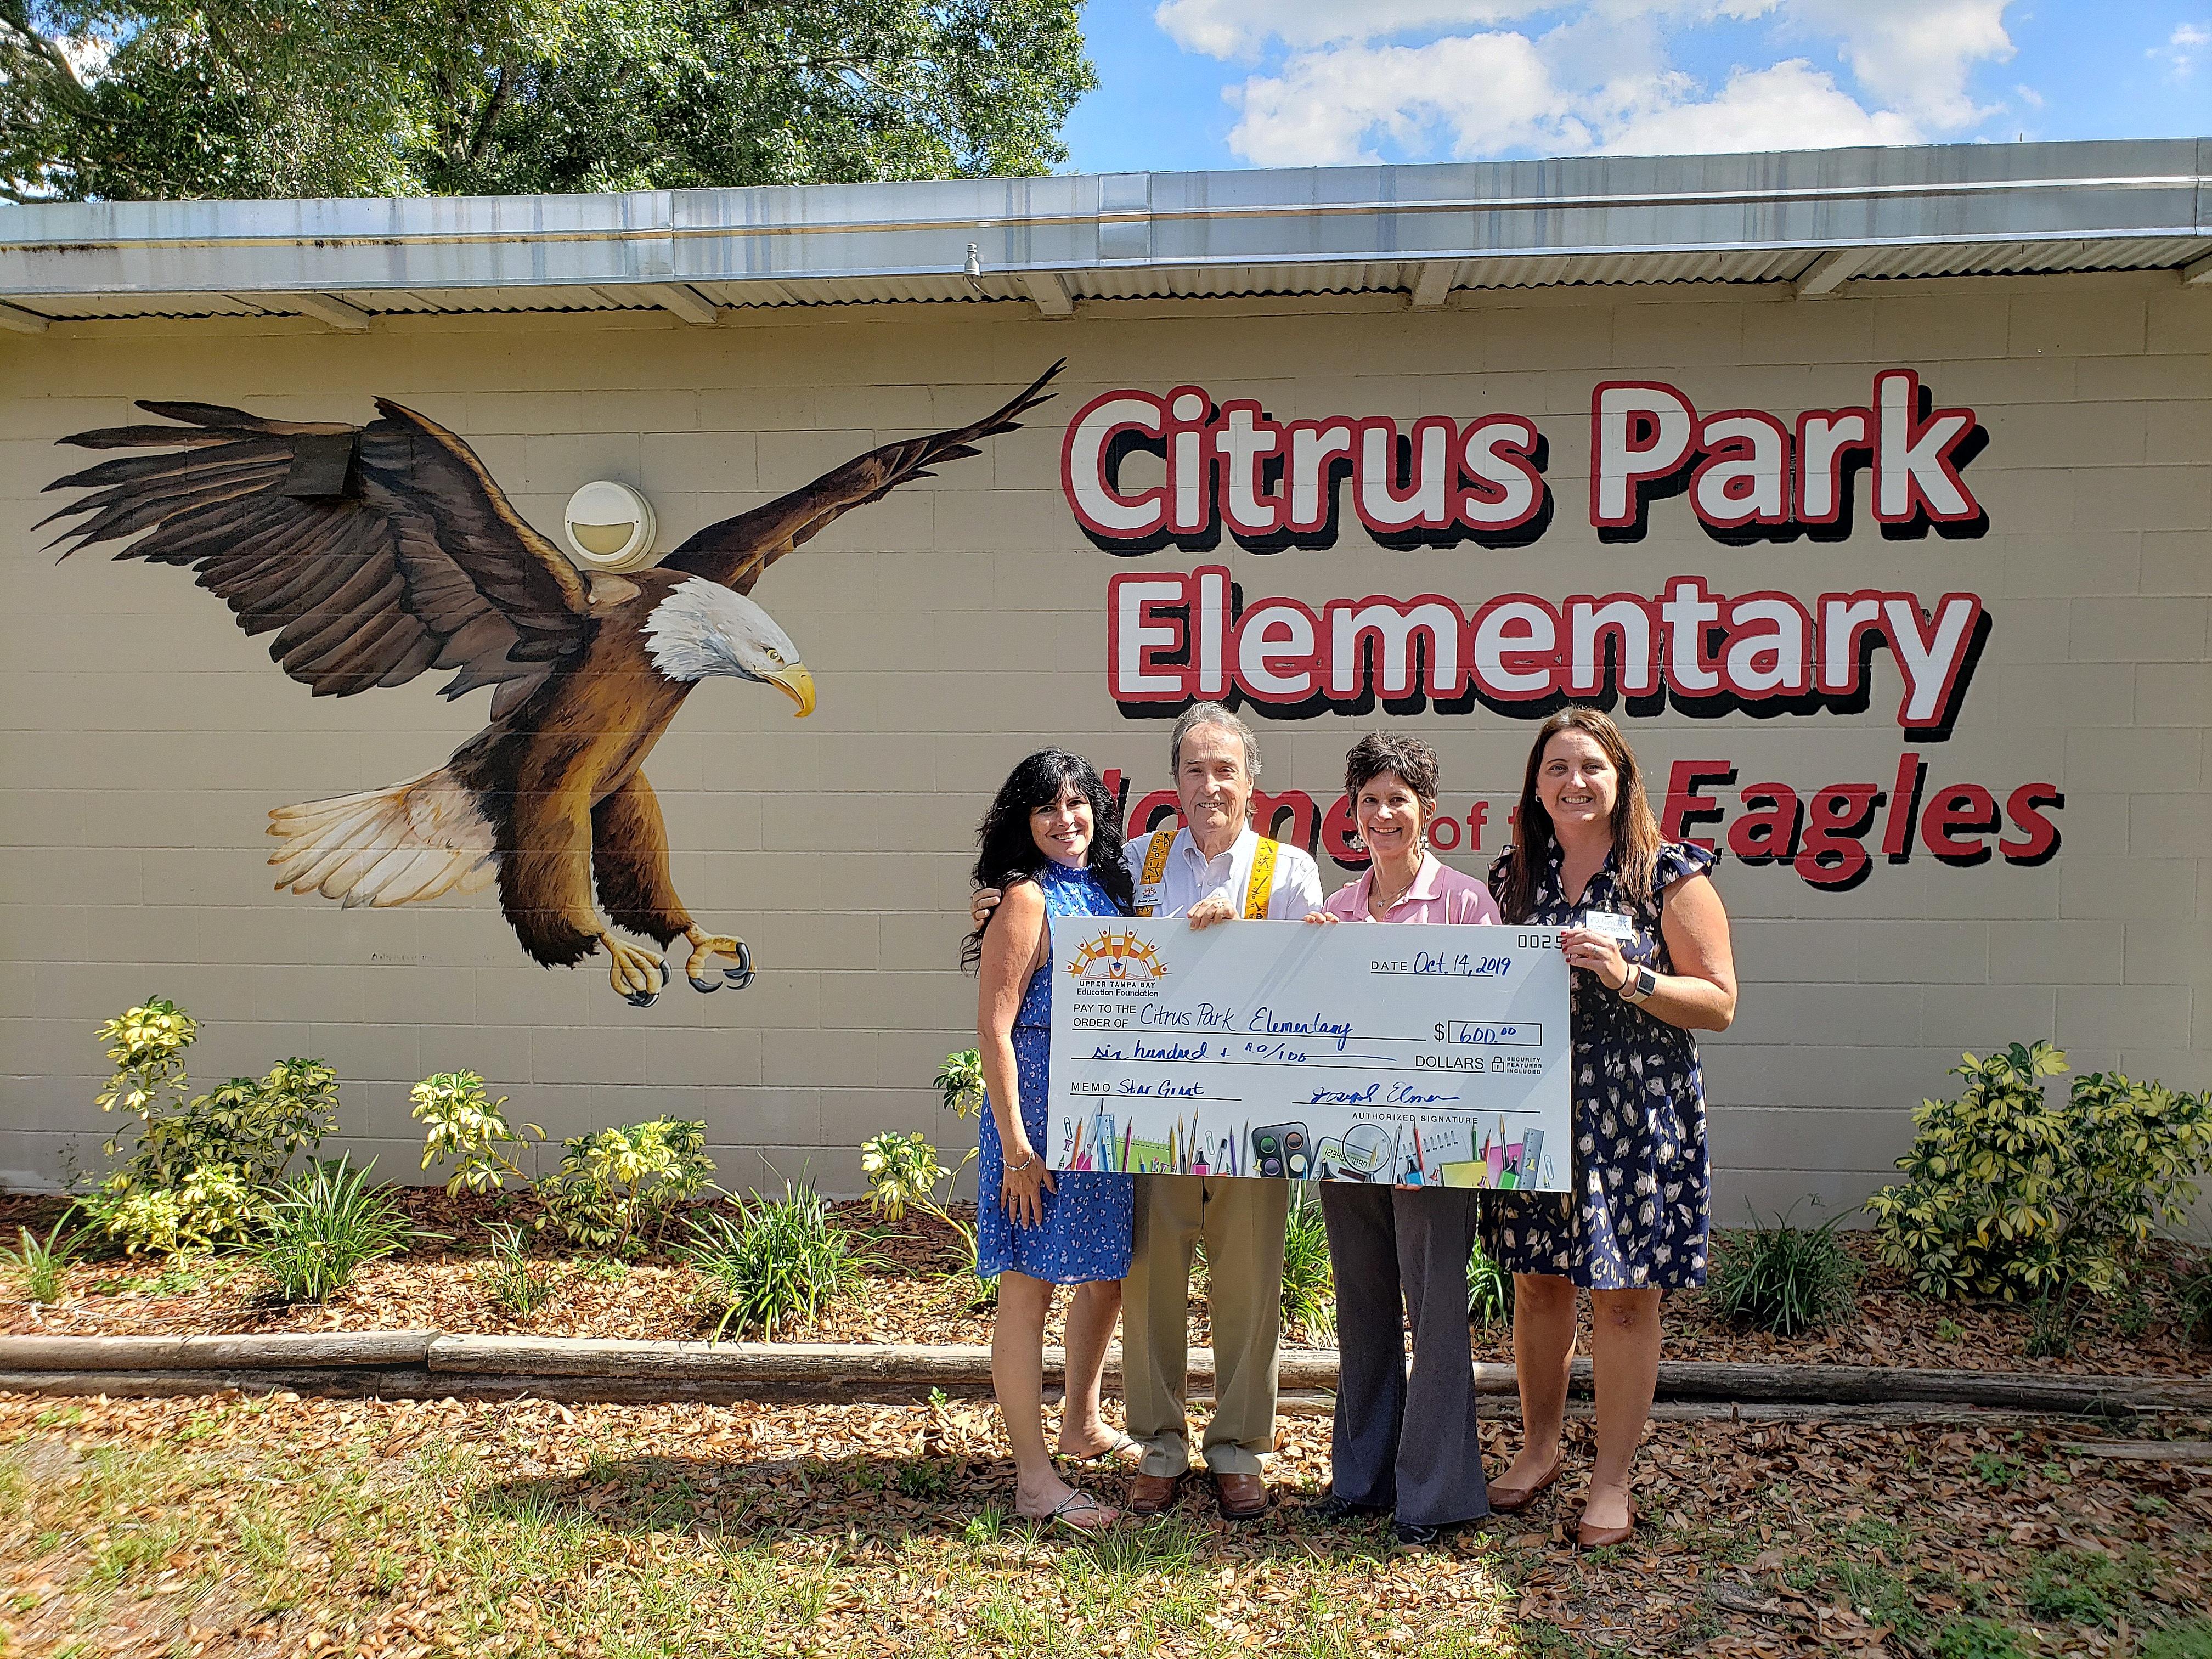 Citrus Park Elementary